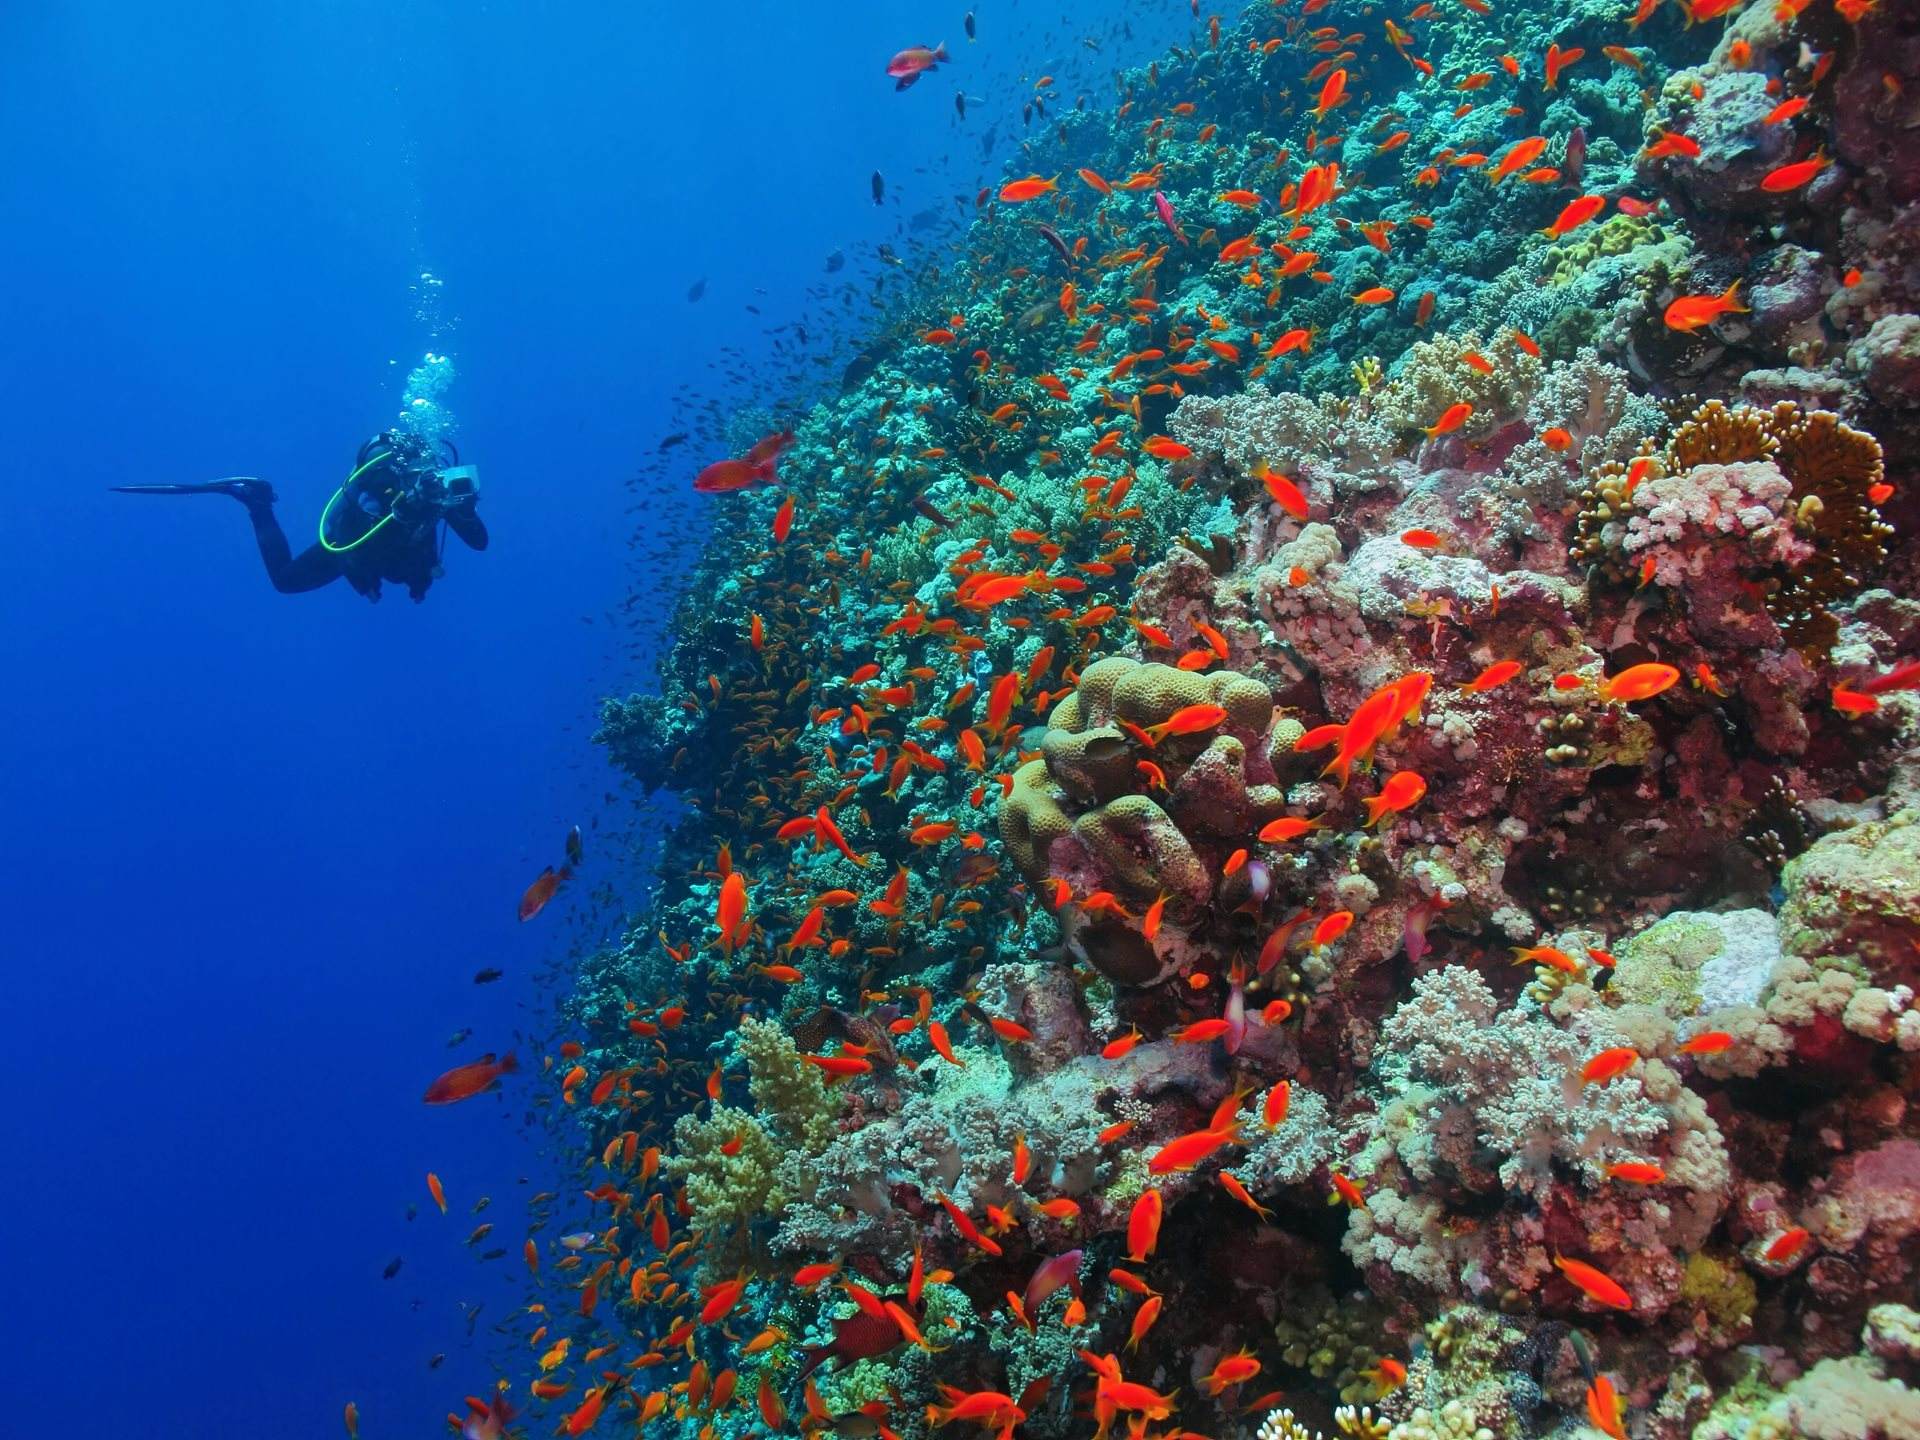 Zanzibar Diving and Snorkelling in the Indian Ocean